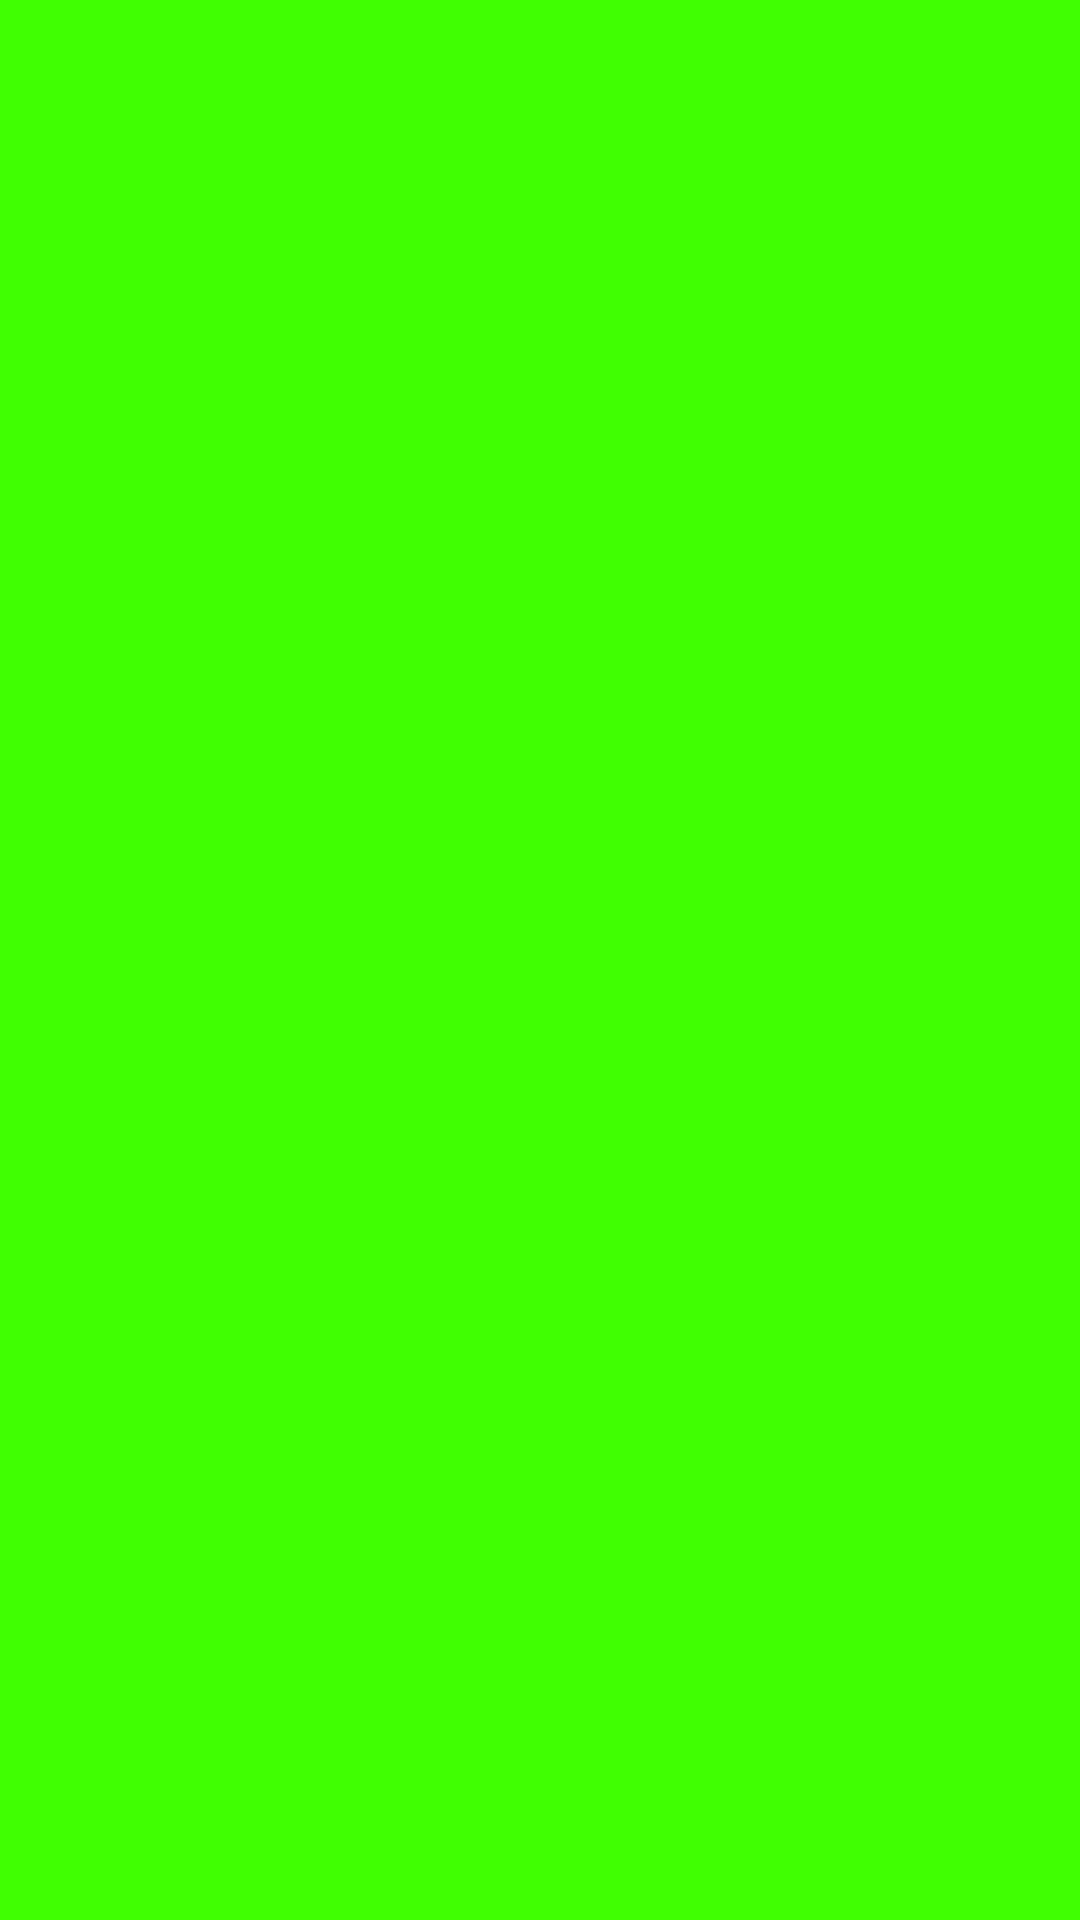 1080x1920 Harlequin Solid Color Background